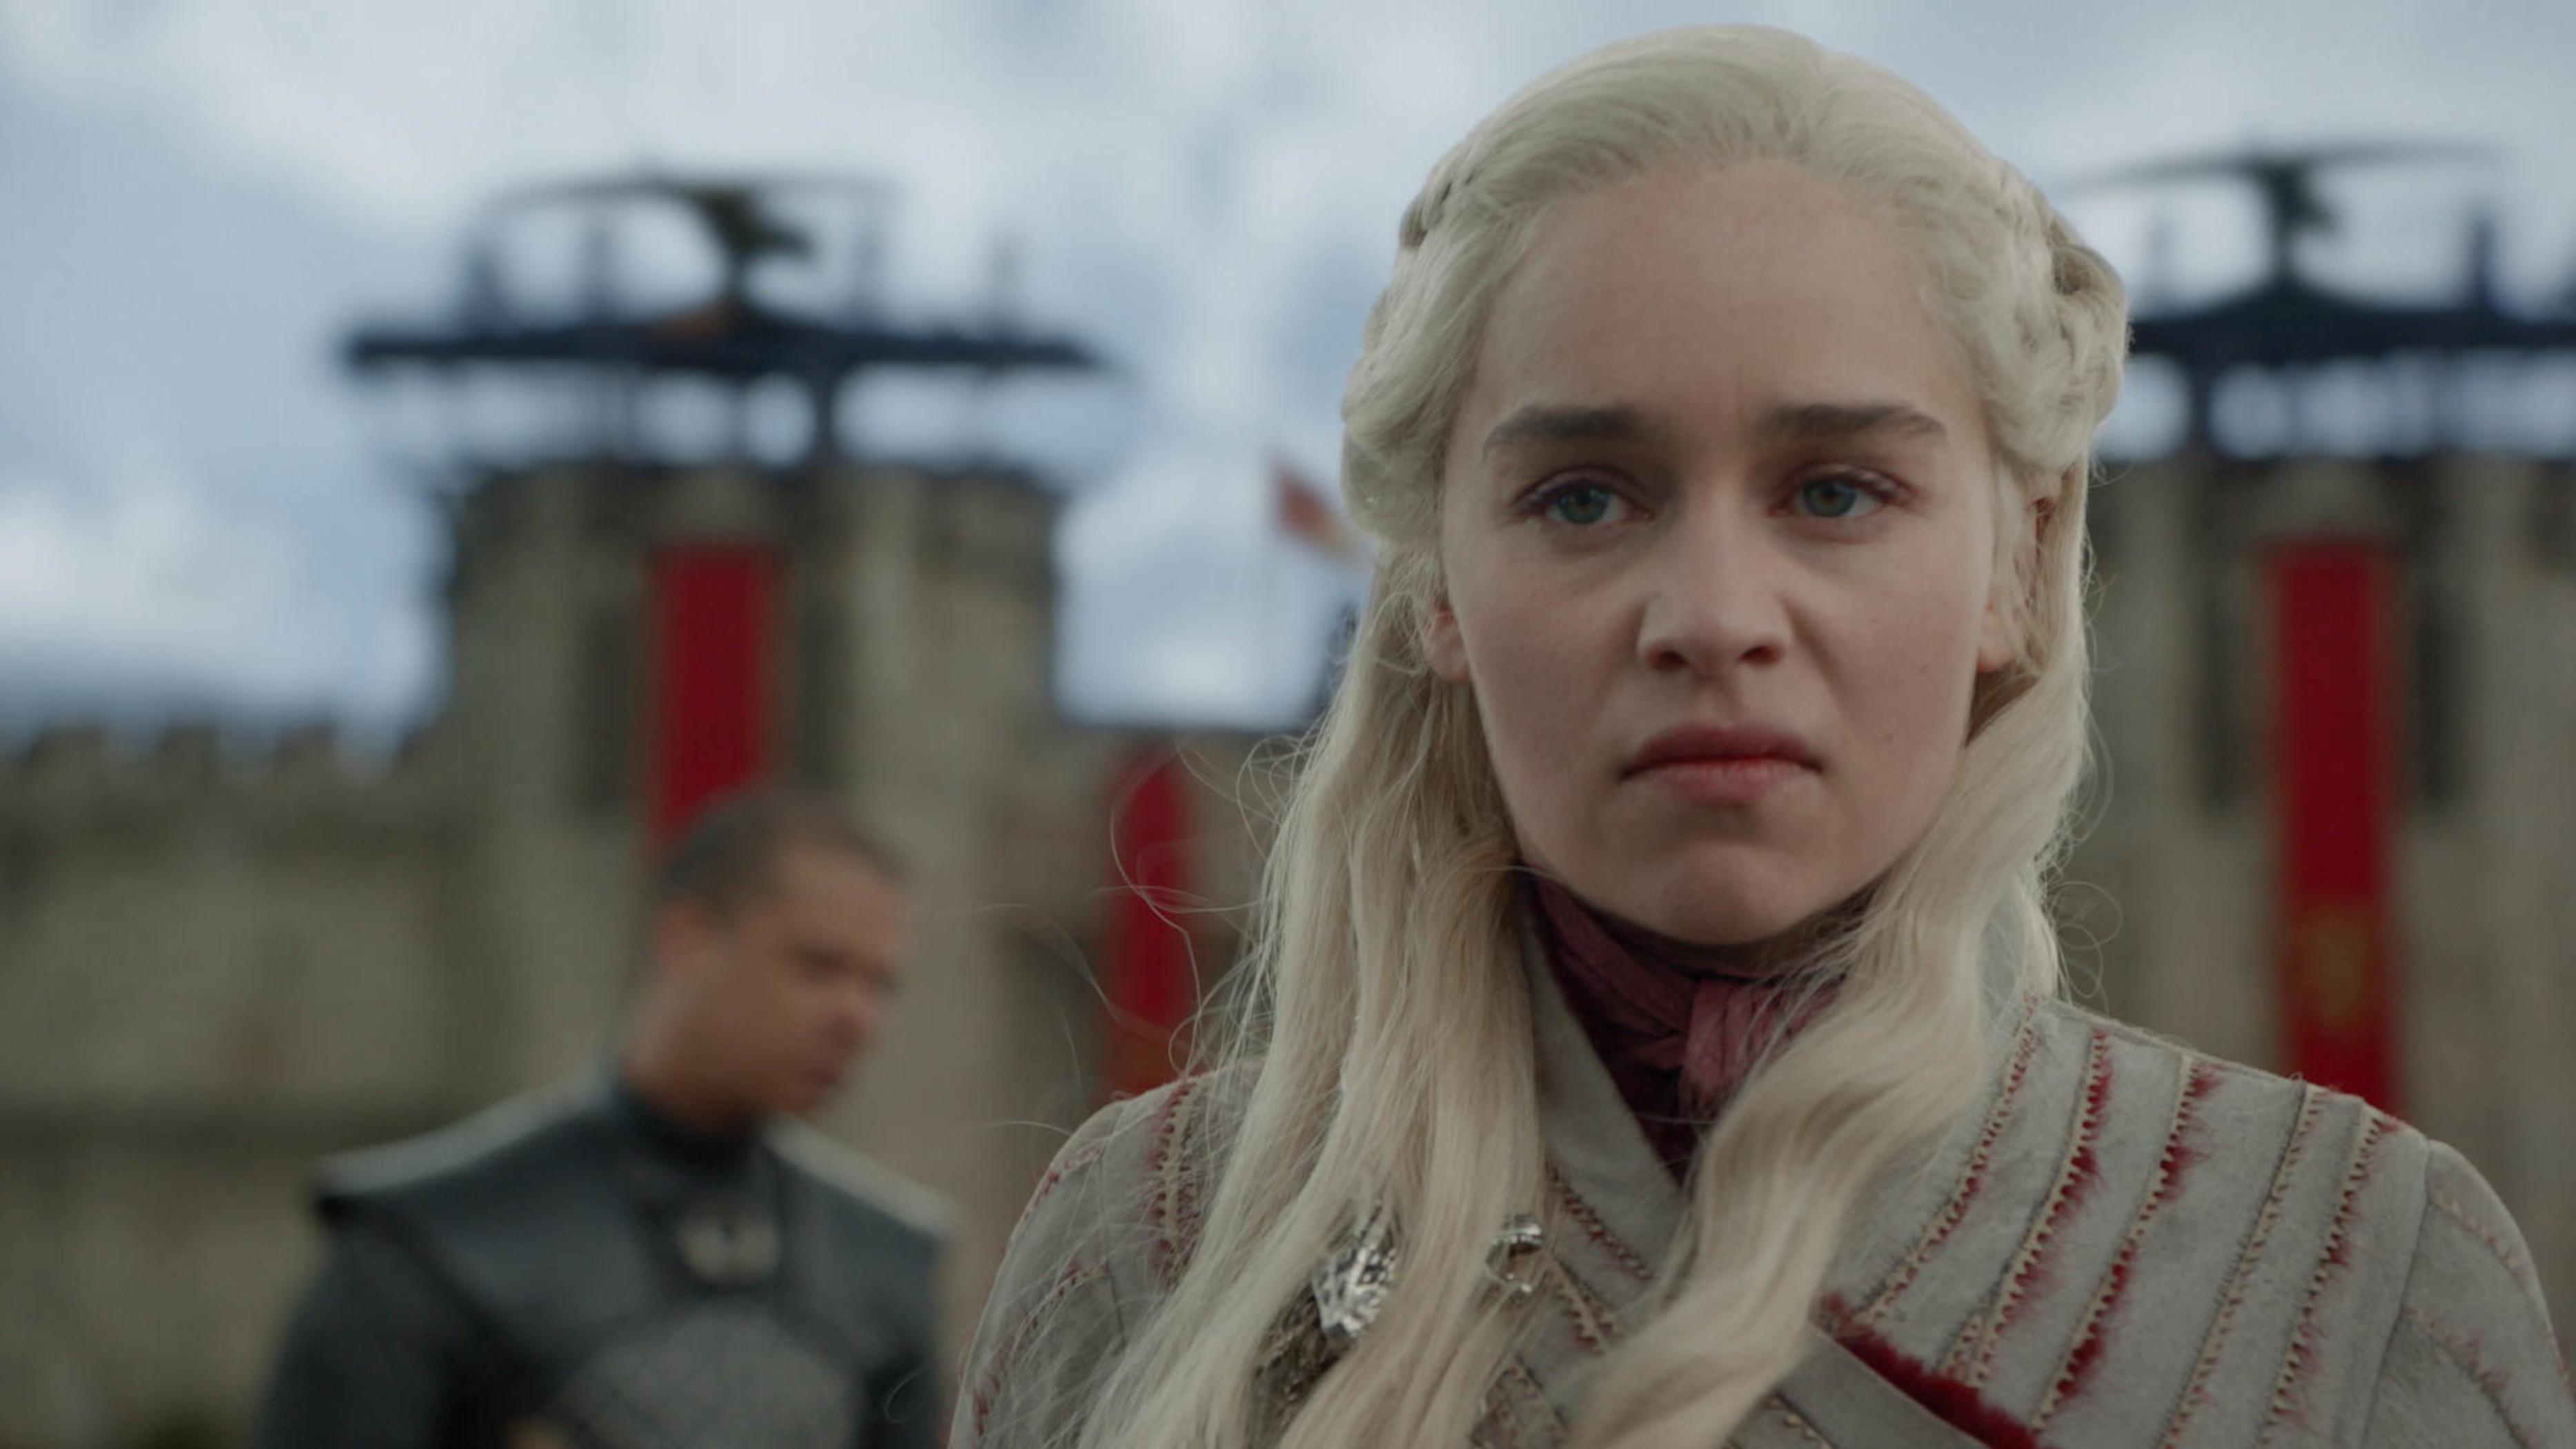 Daenerys Targaryen storming away after Missandei's murder (Episode 4 of 'Game of Thrones').